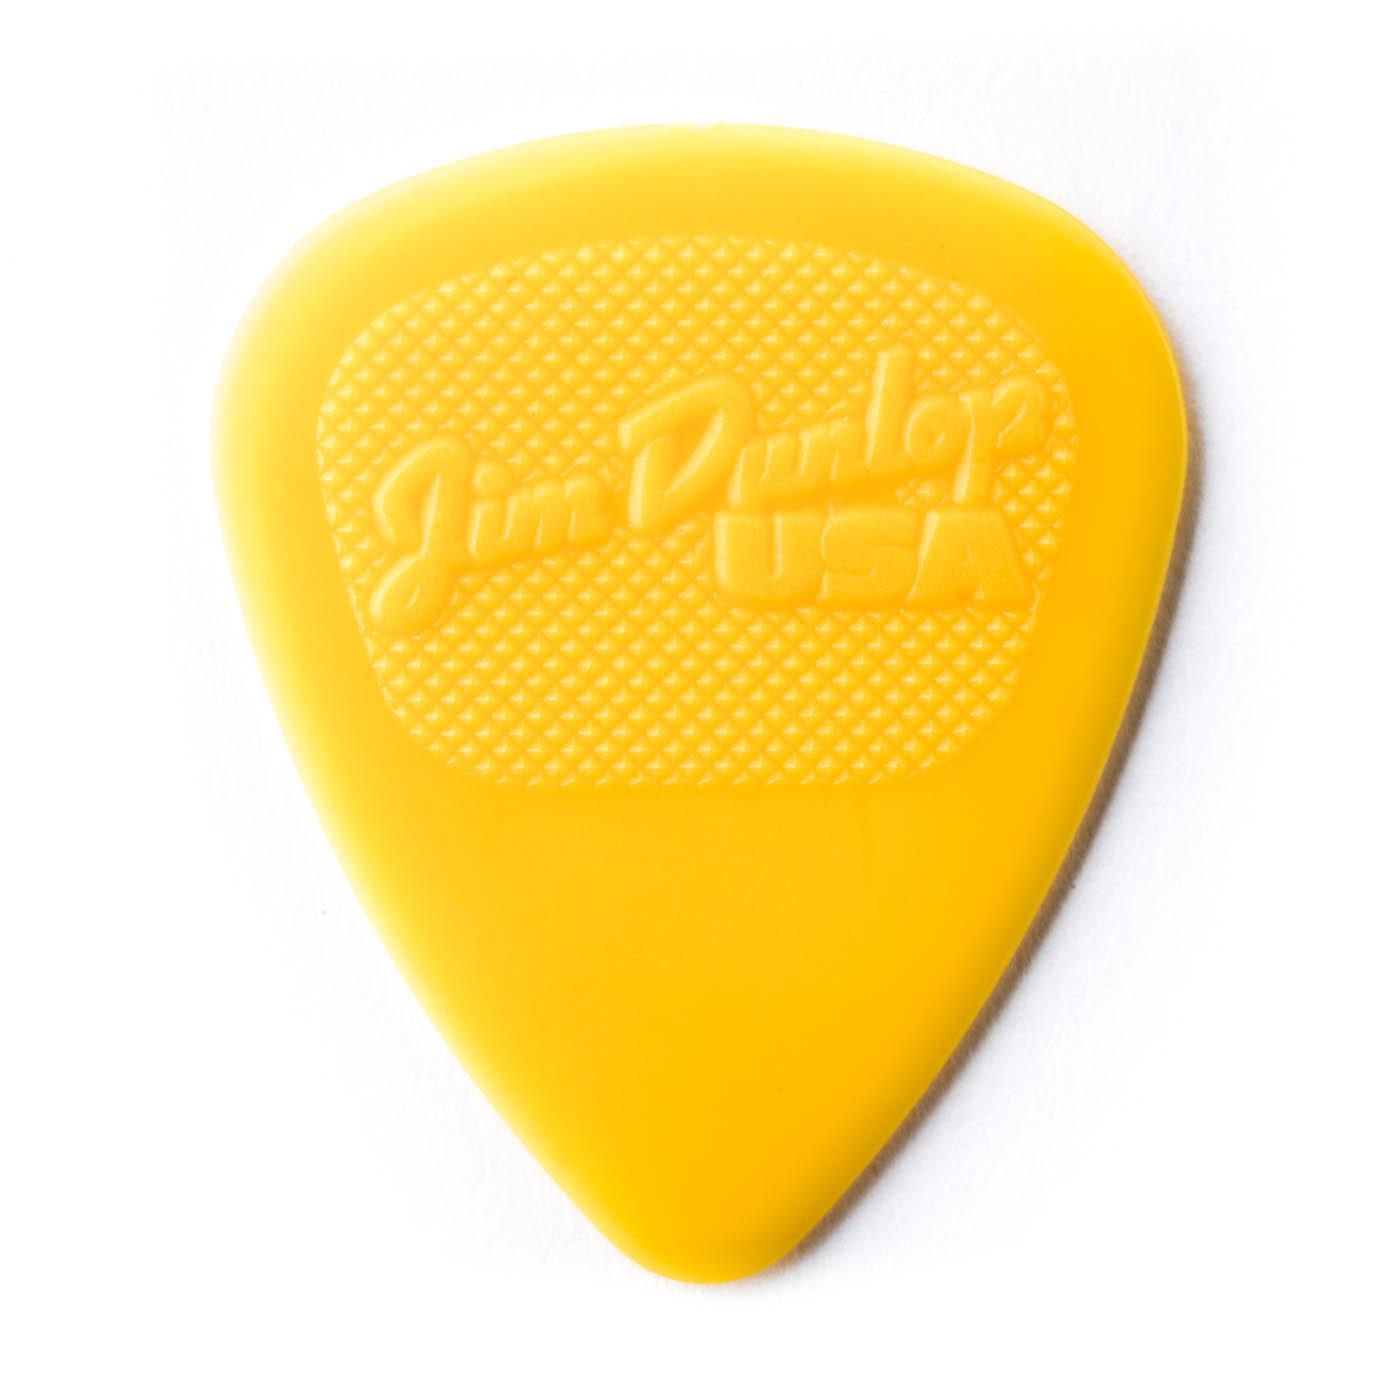 Dunlop - Nylon Midi 0,80 yellow